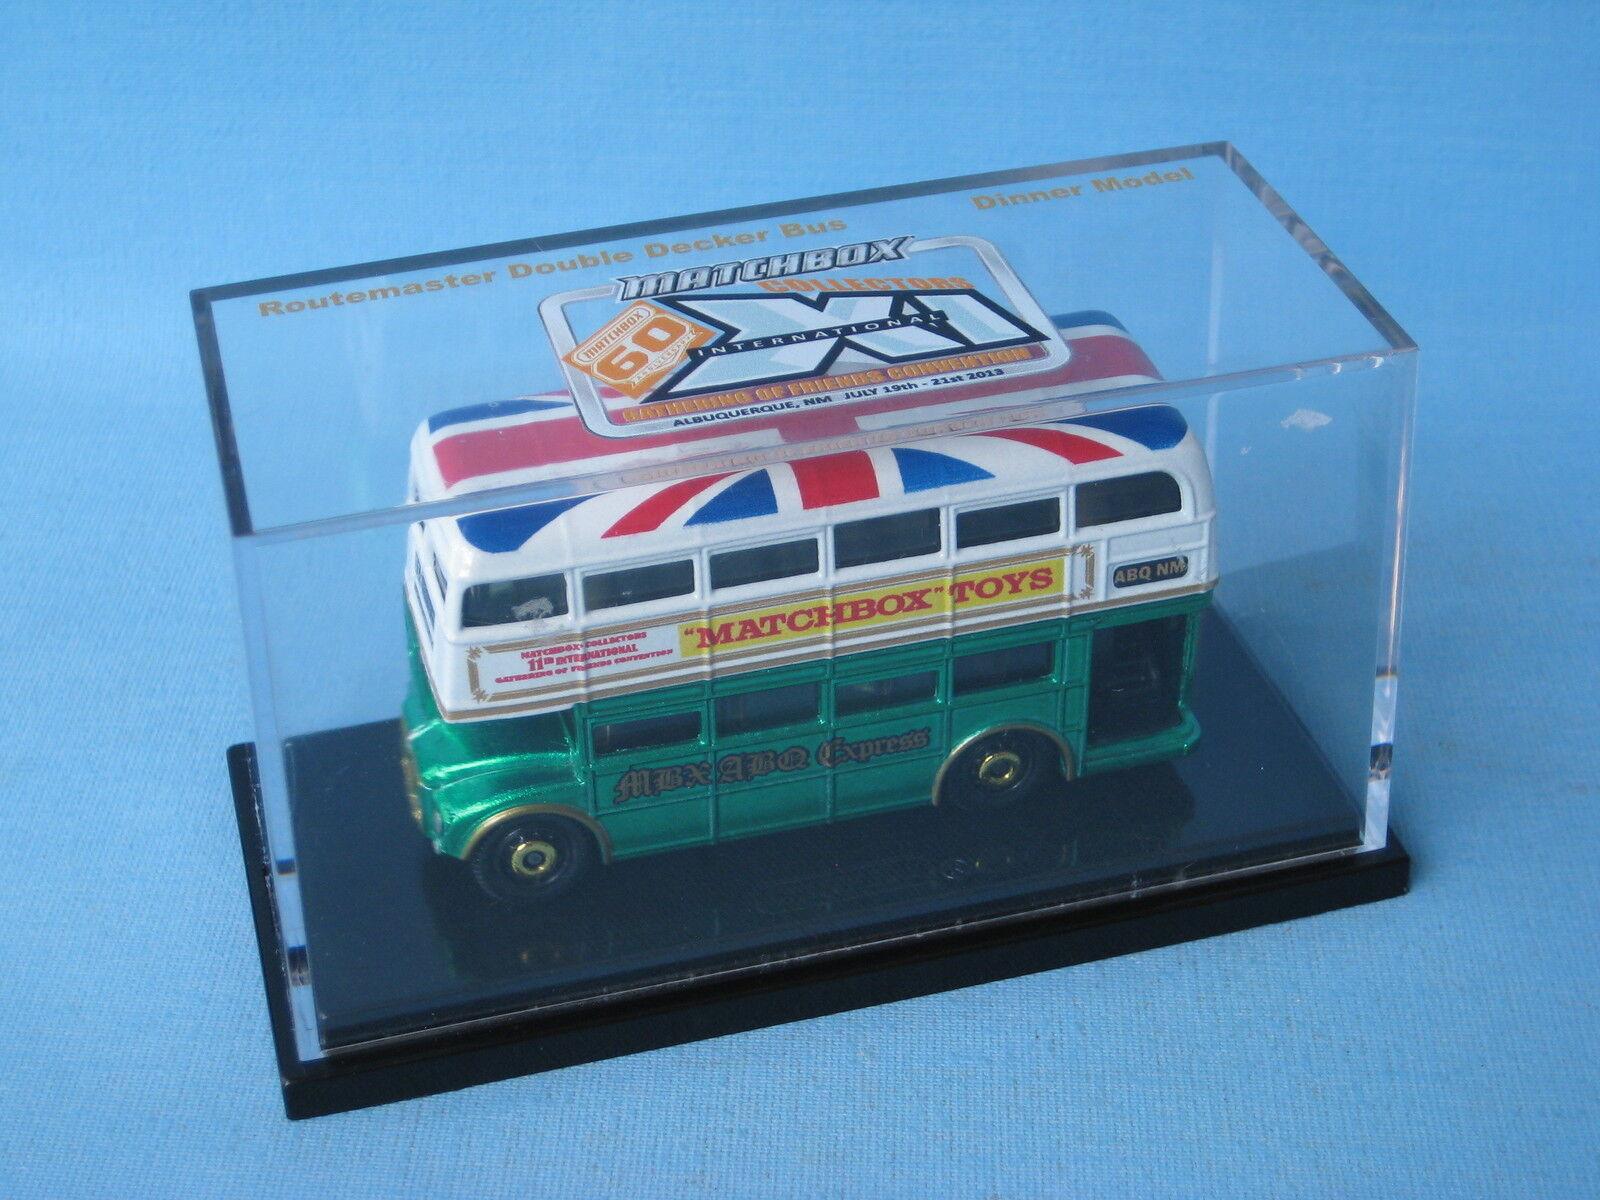 Matchbox Routemaster Bus 2013 Gathebague Dinner Model Rare blanc and  vert  magasin en ligne